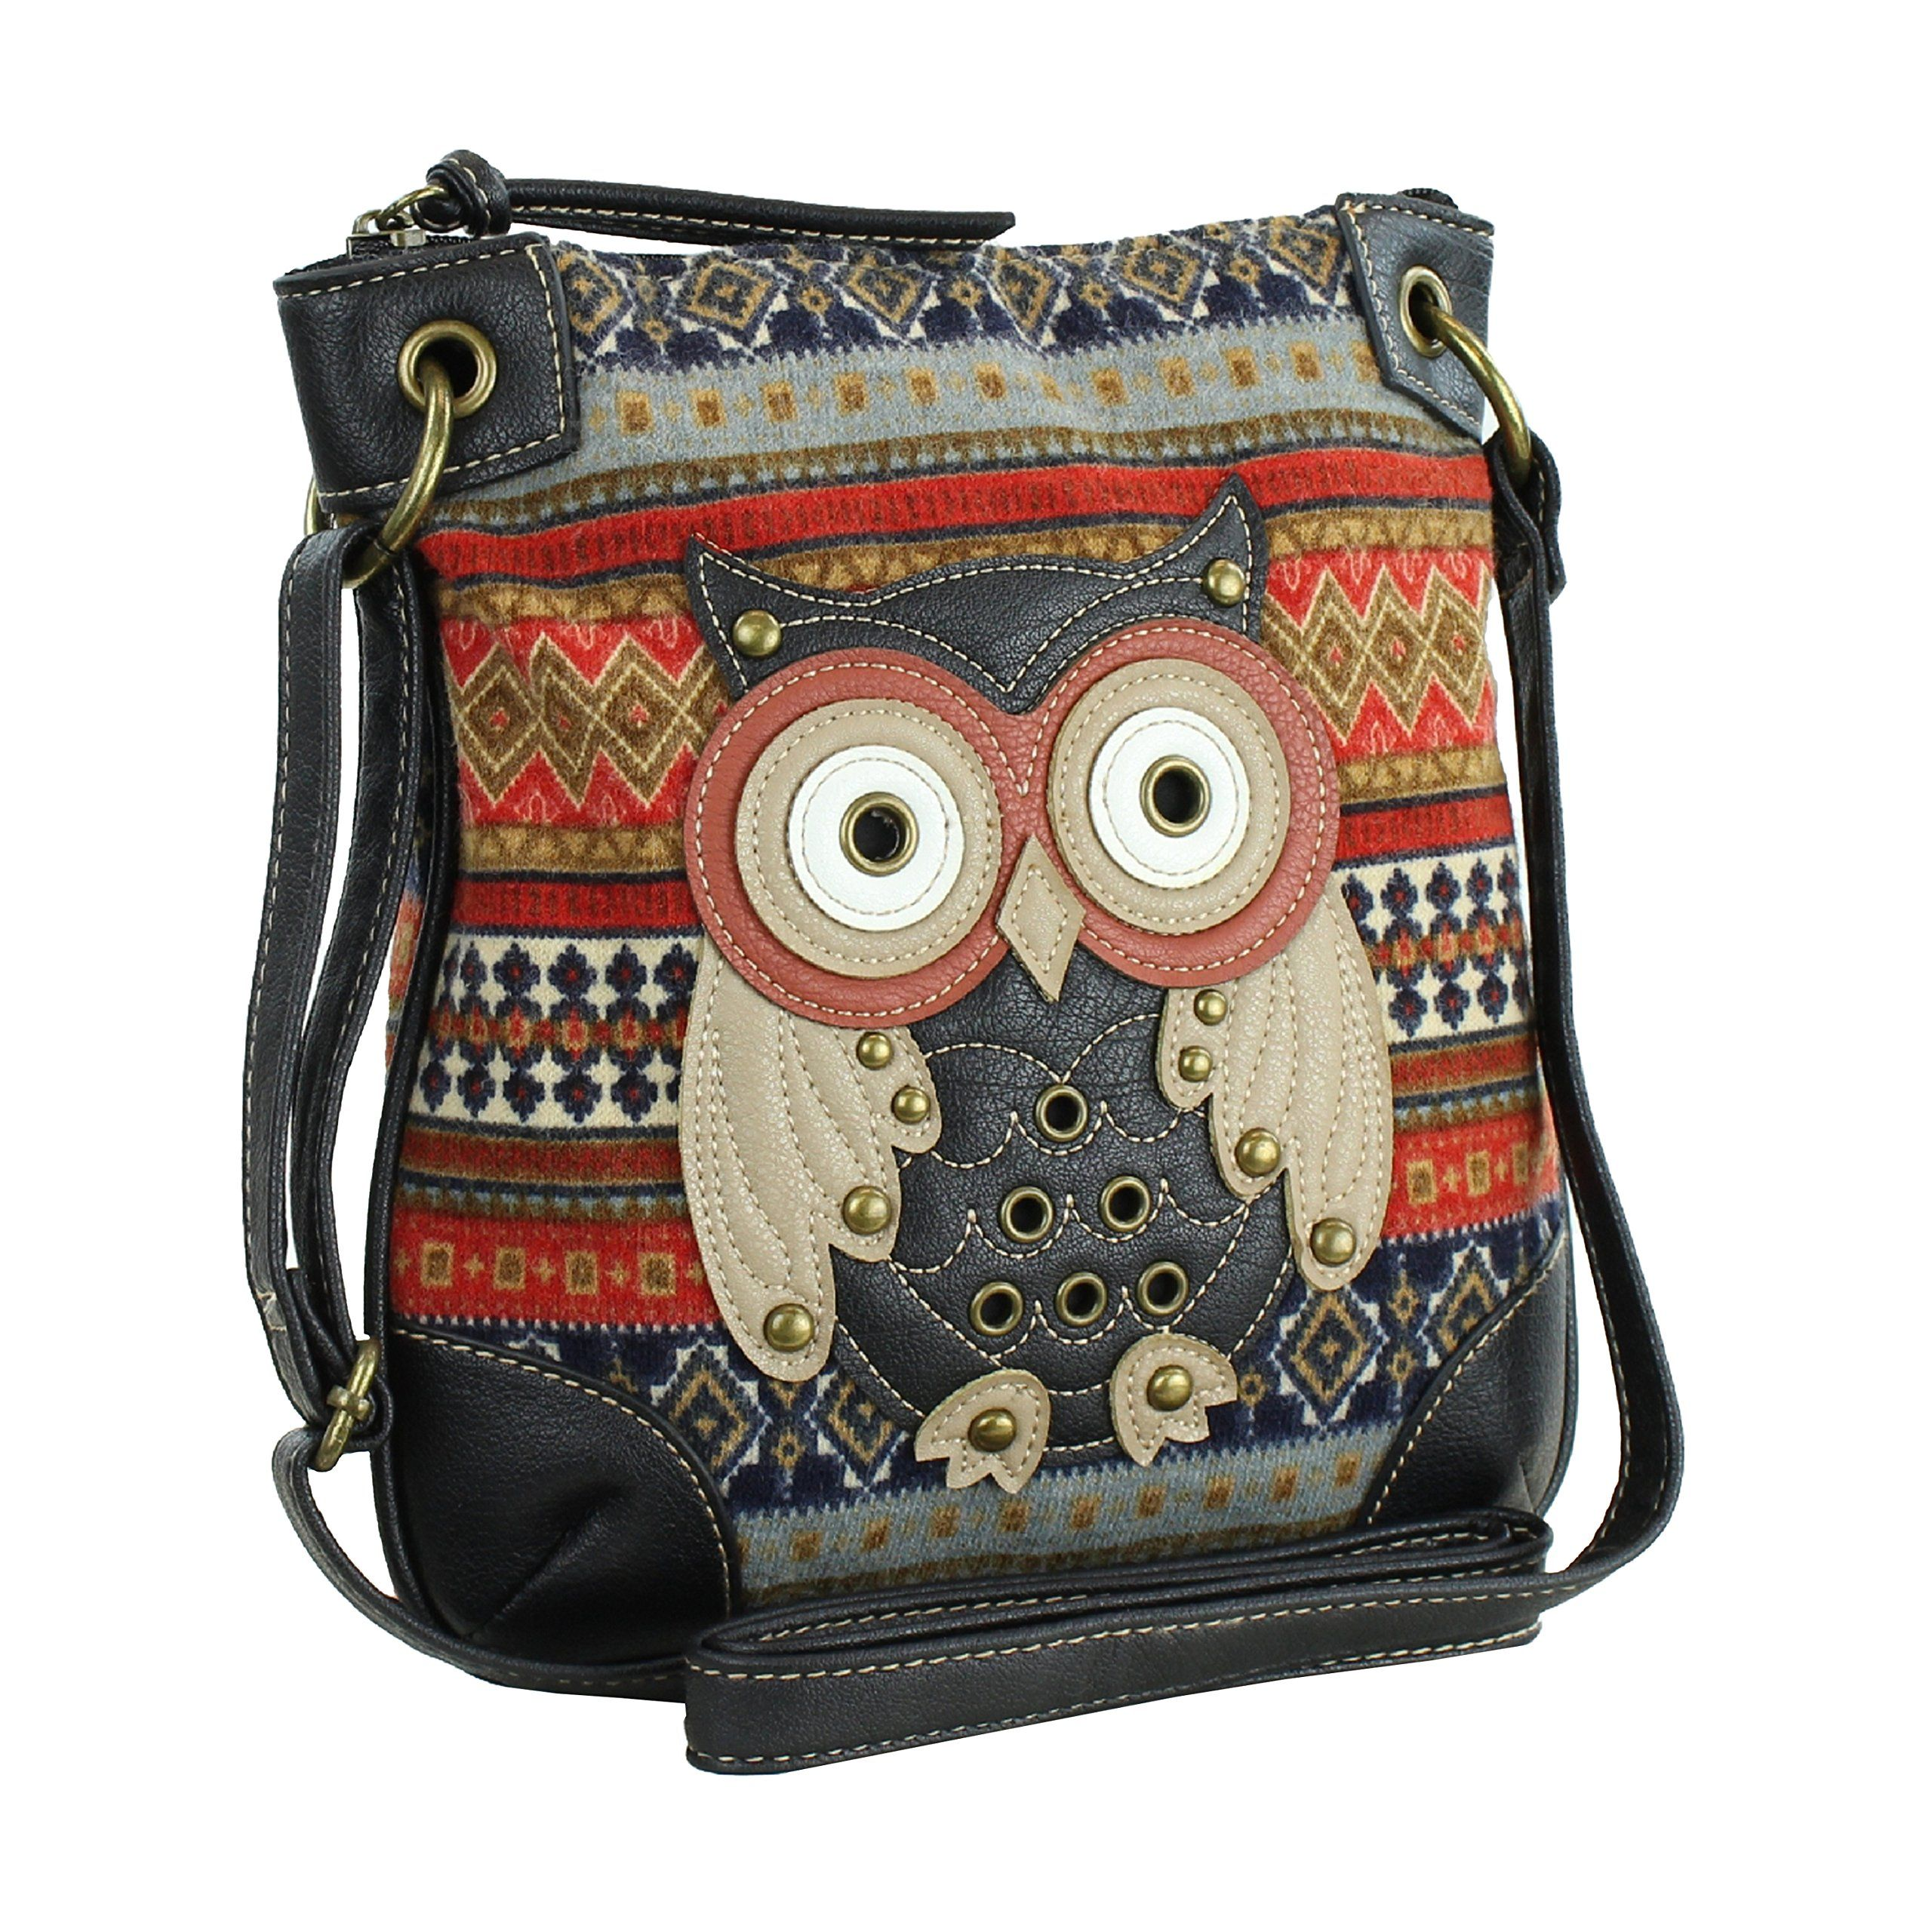 Orange Messenger Bag W Studded Patchwork Owl Lique